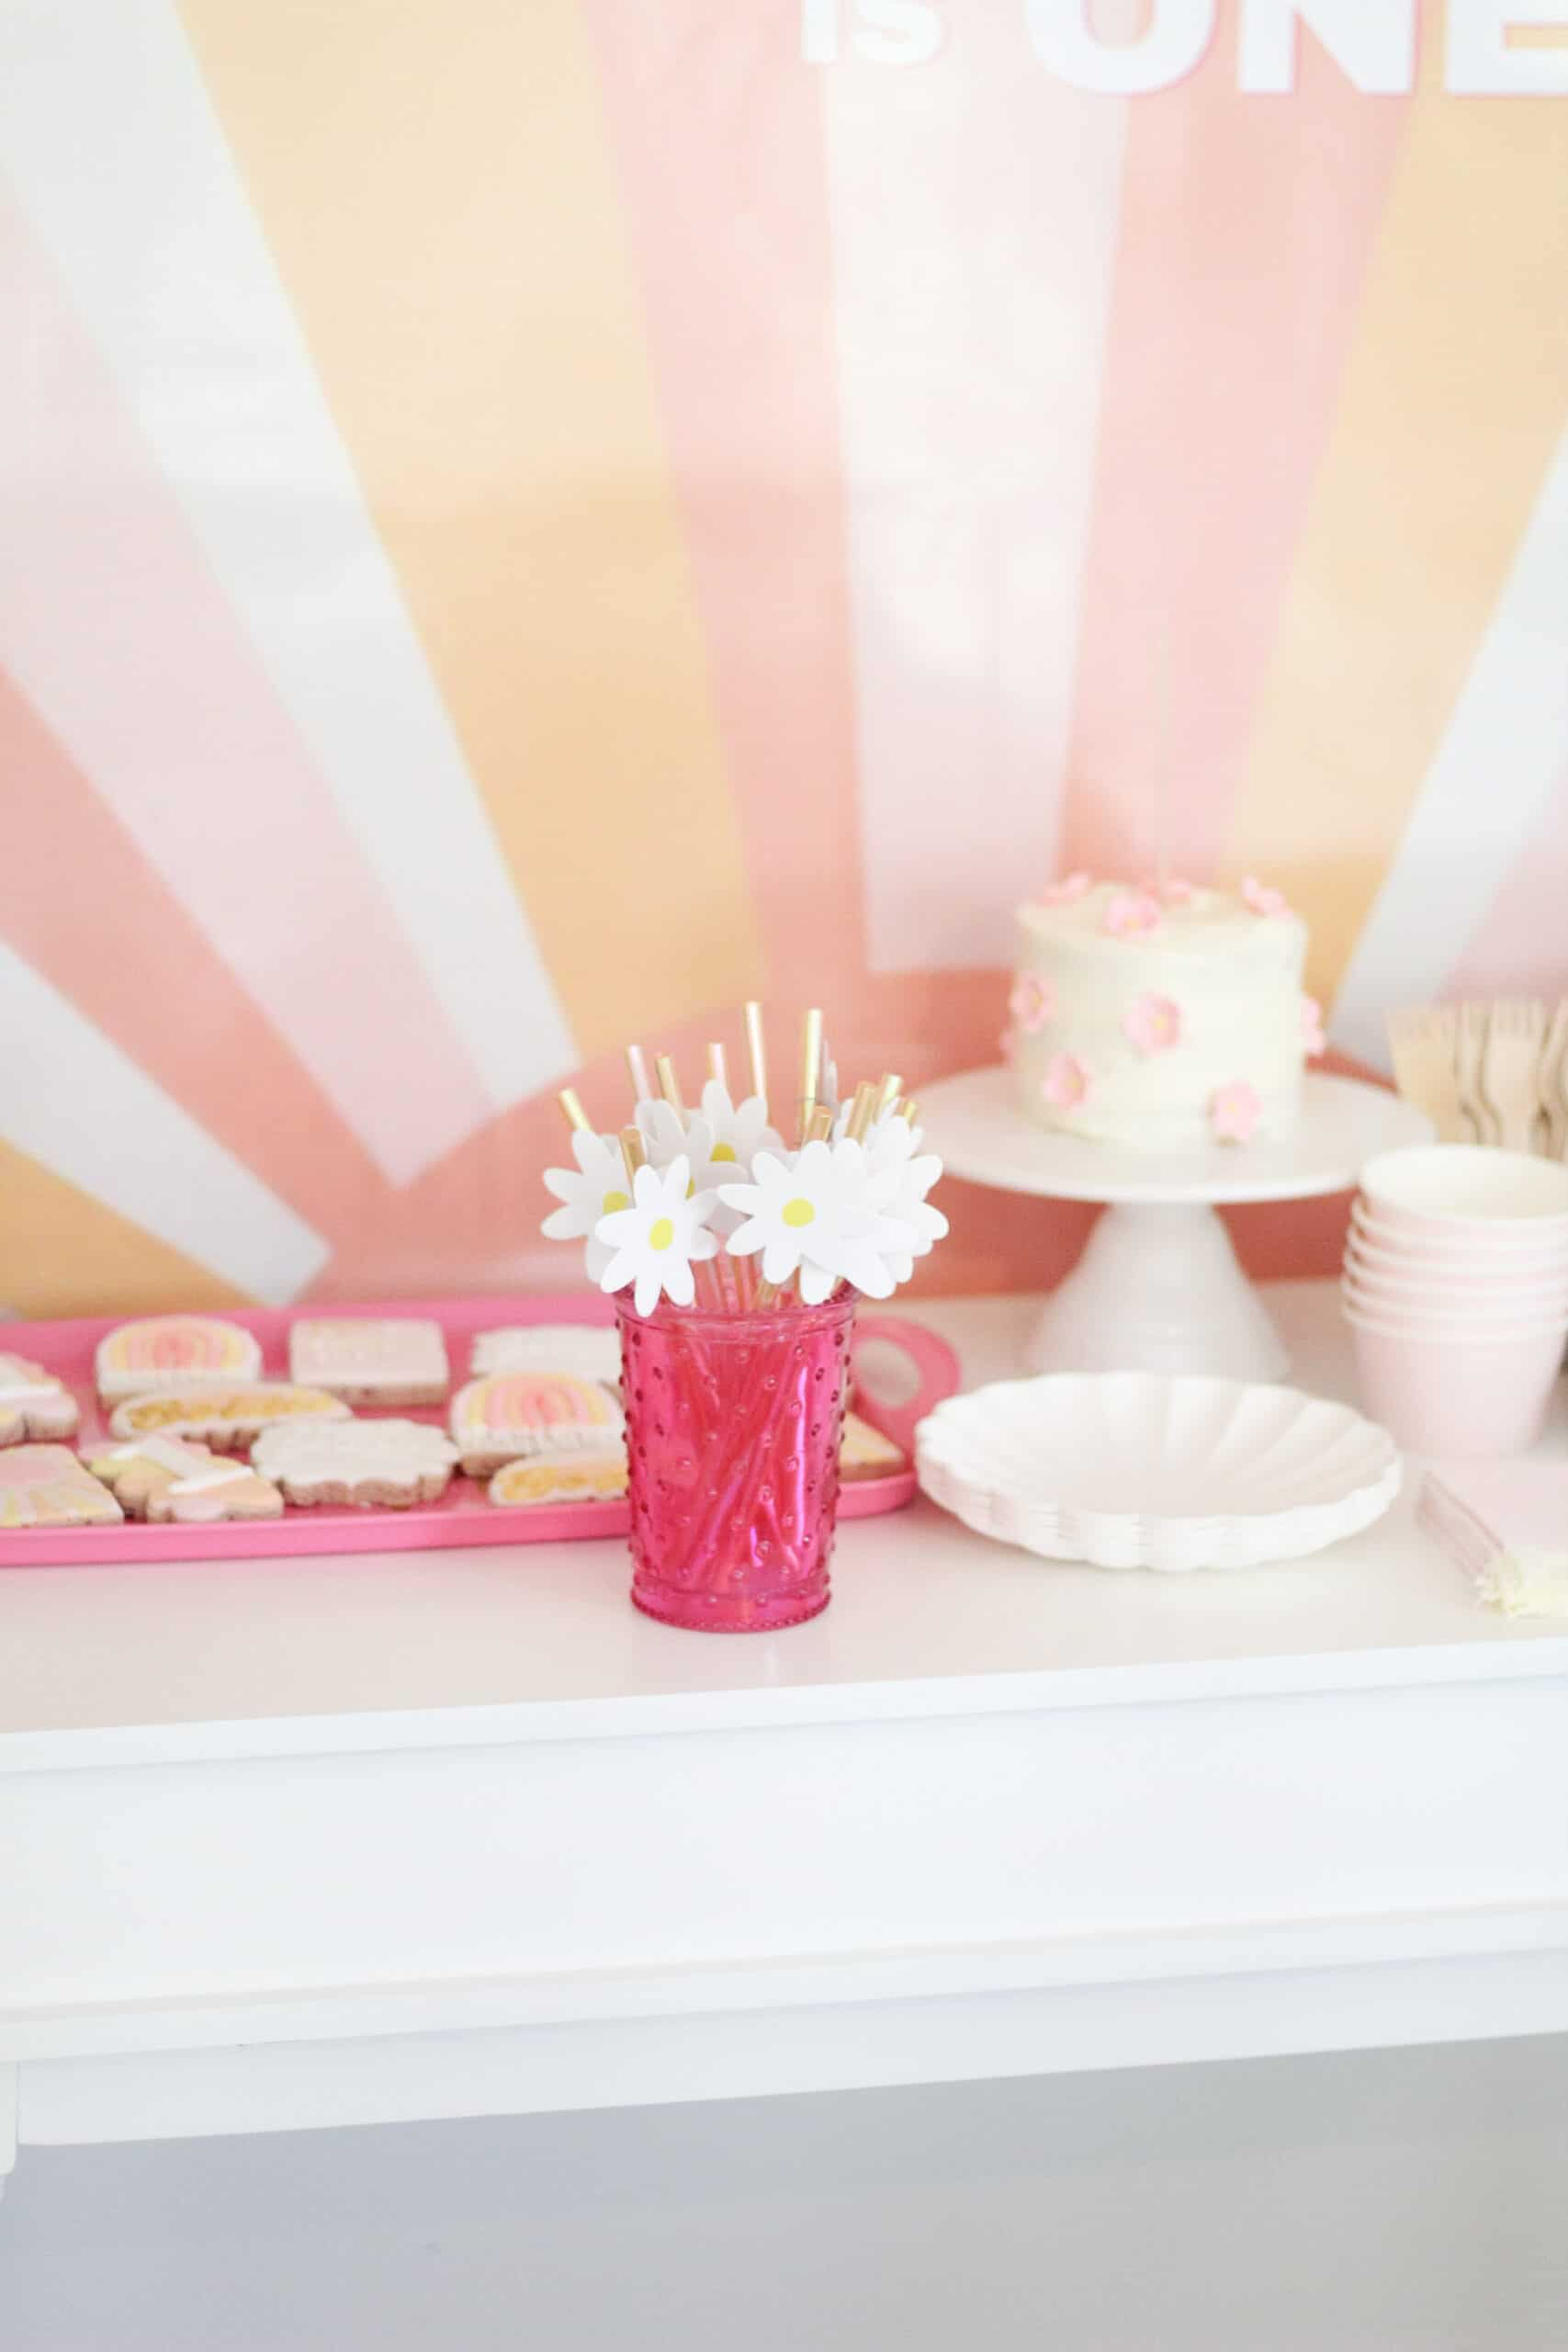 Happy birthday sunshine party table